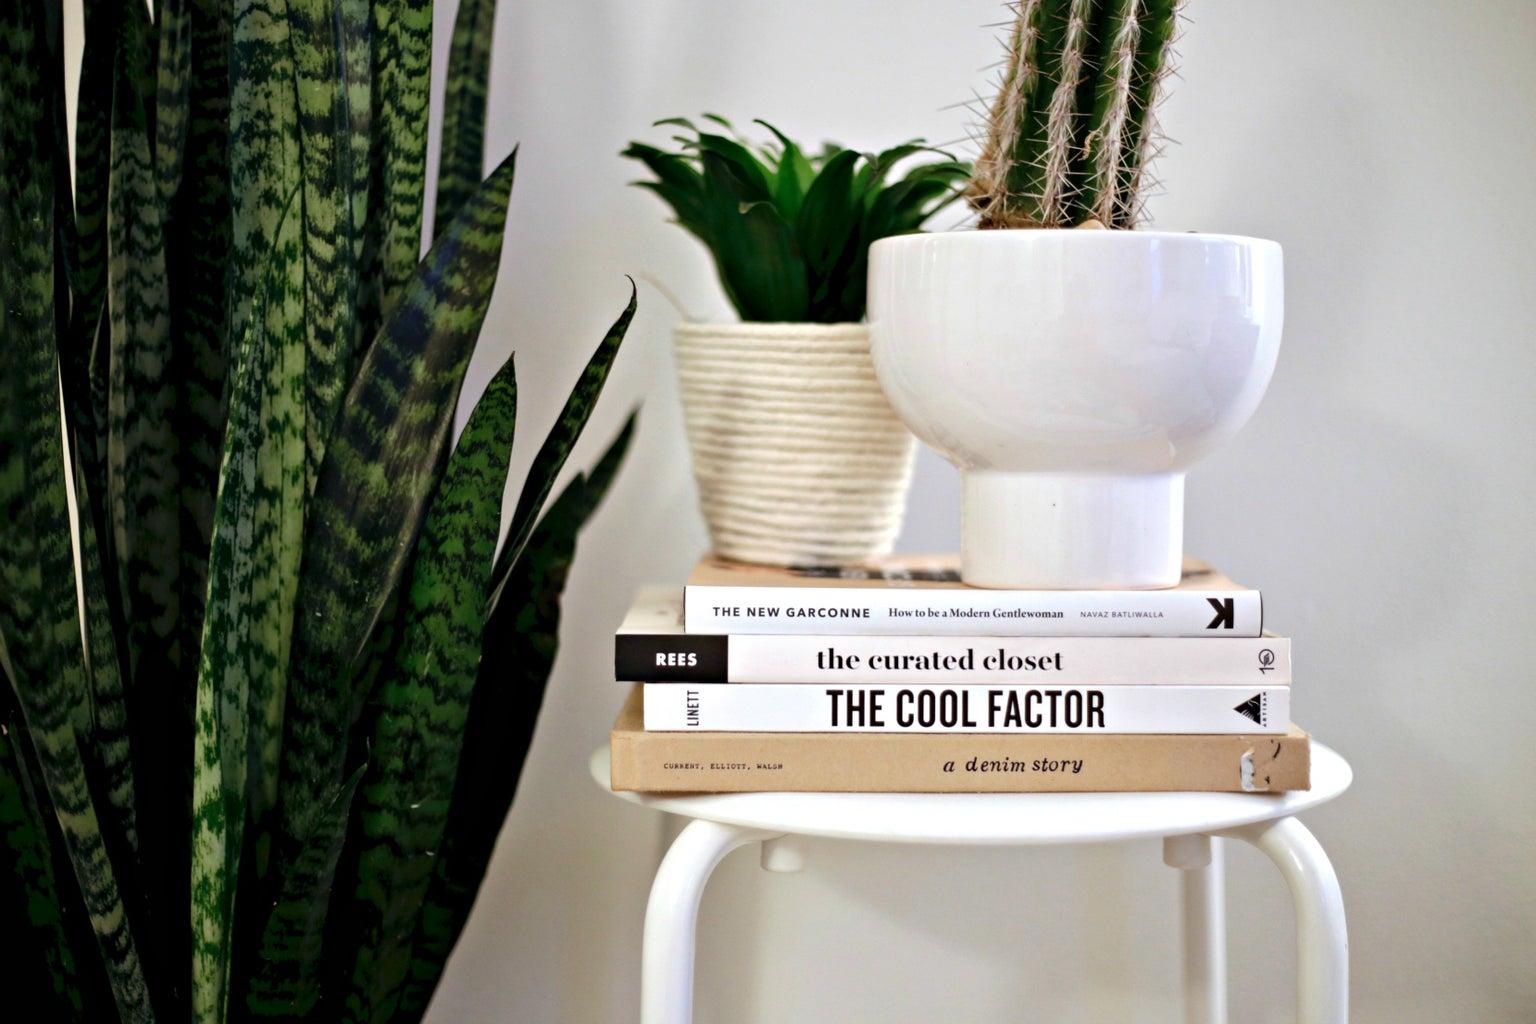 book fashion plants minimal cactus cacti cool style